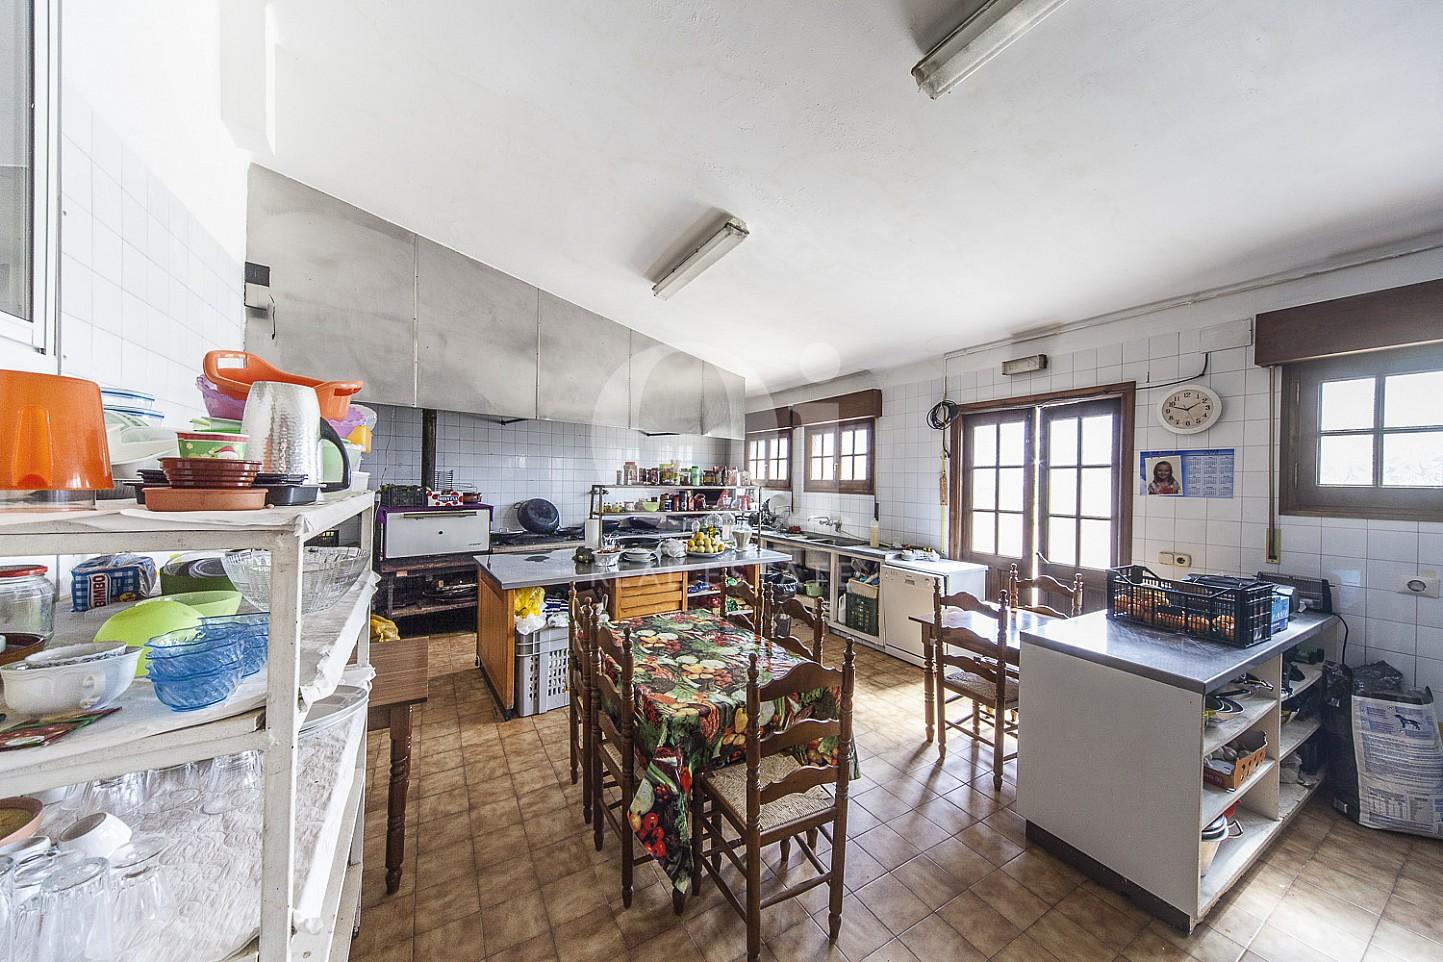 Cocina de casa en venta en Borrassà, alto Ampurdán, Gerona